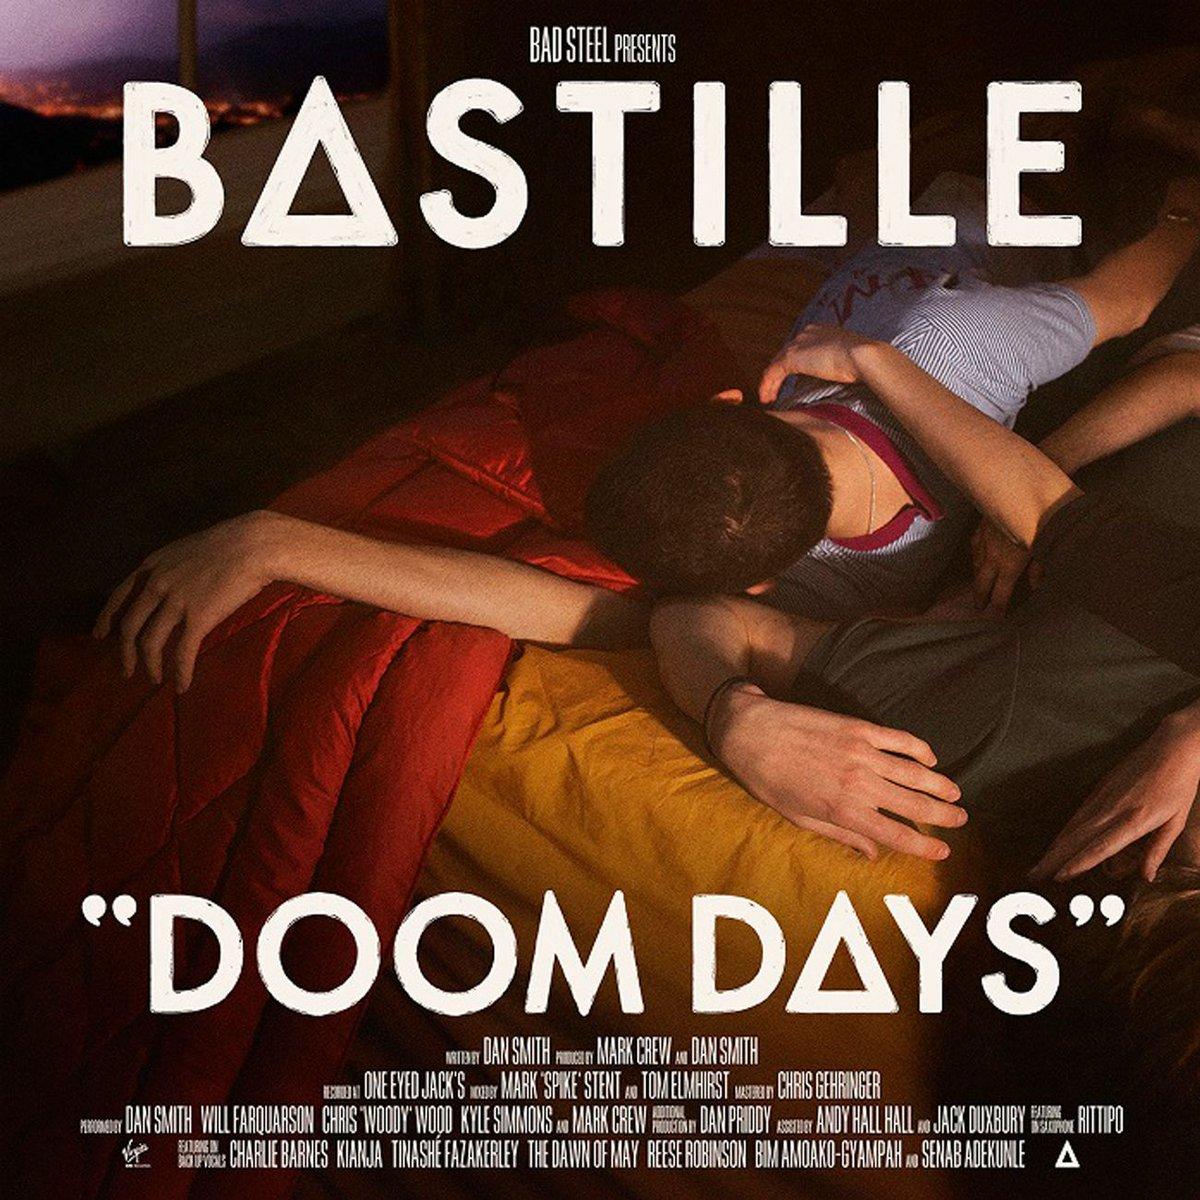 Did you read my review of @bastilledan new album Dooms Day?  https://buff.ly/2IezaBC  @OneUniqueBlog  #musicblogger #albumreview #musicreview #doomsday #bastille #album